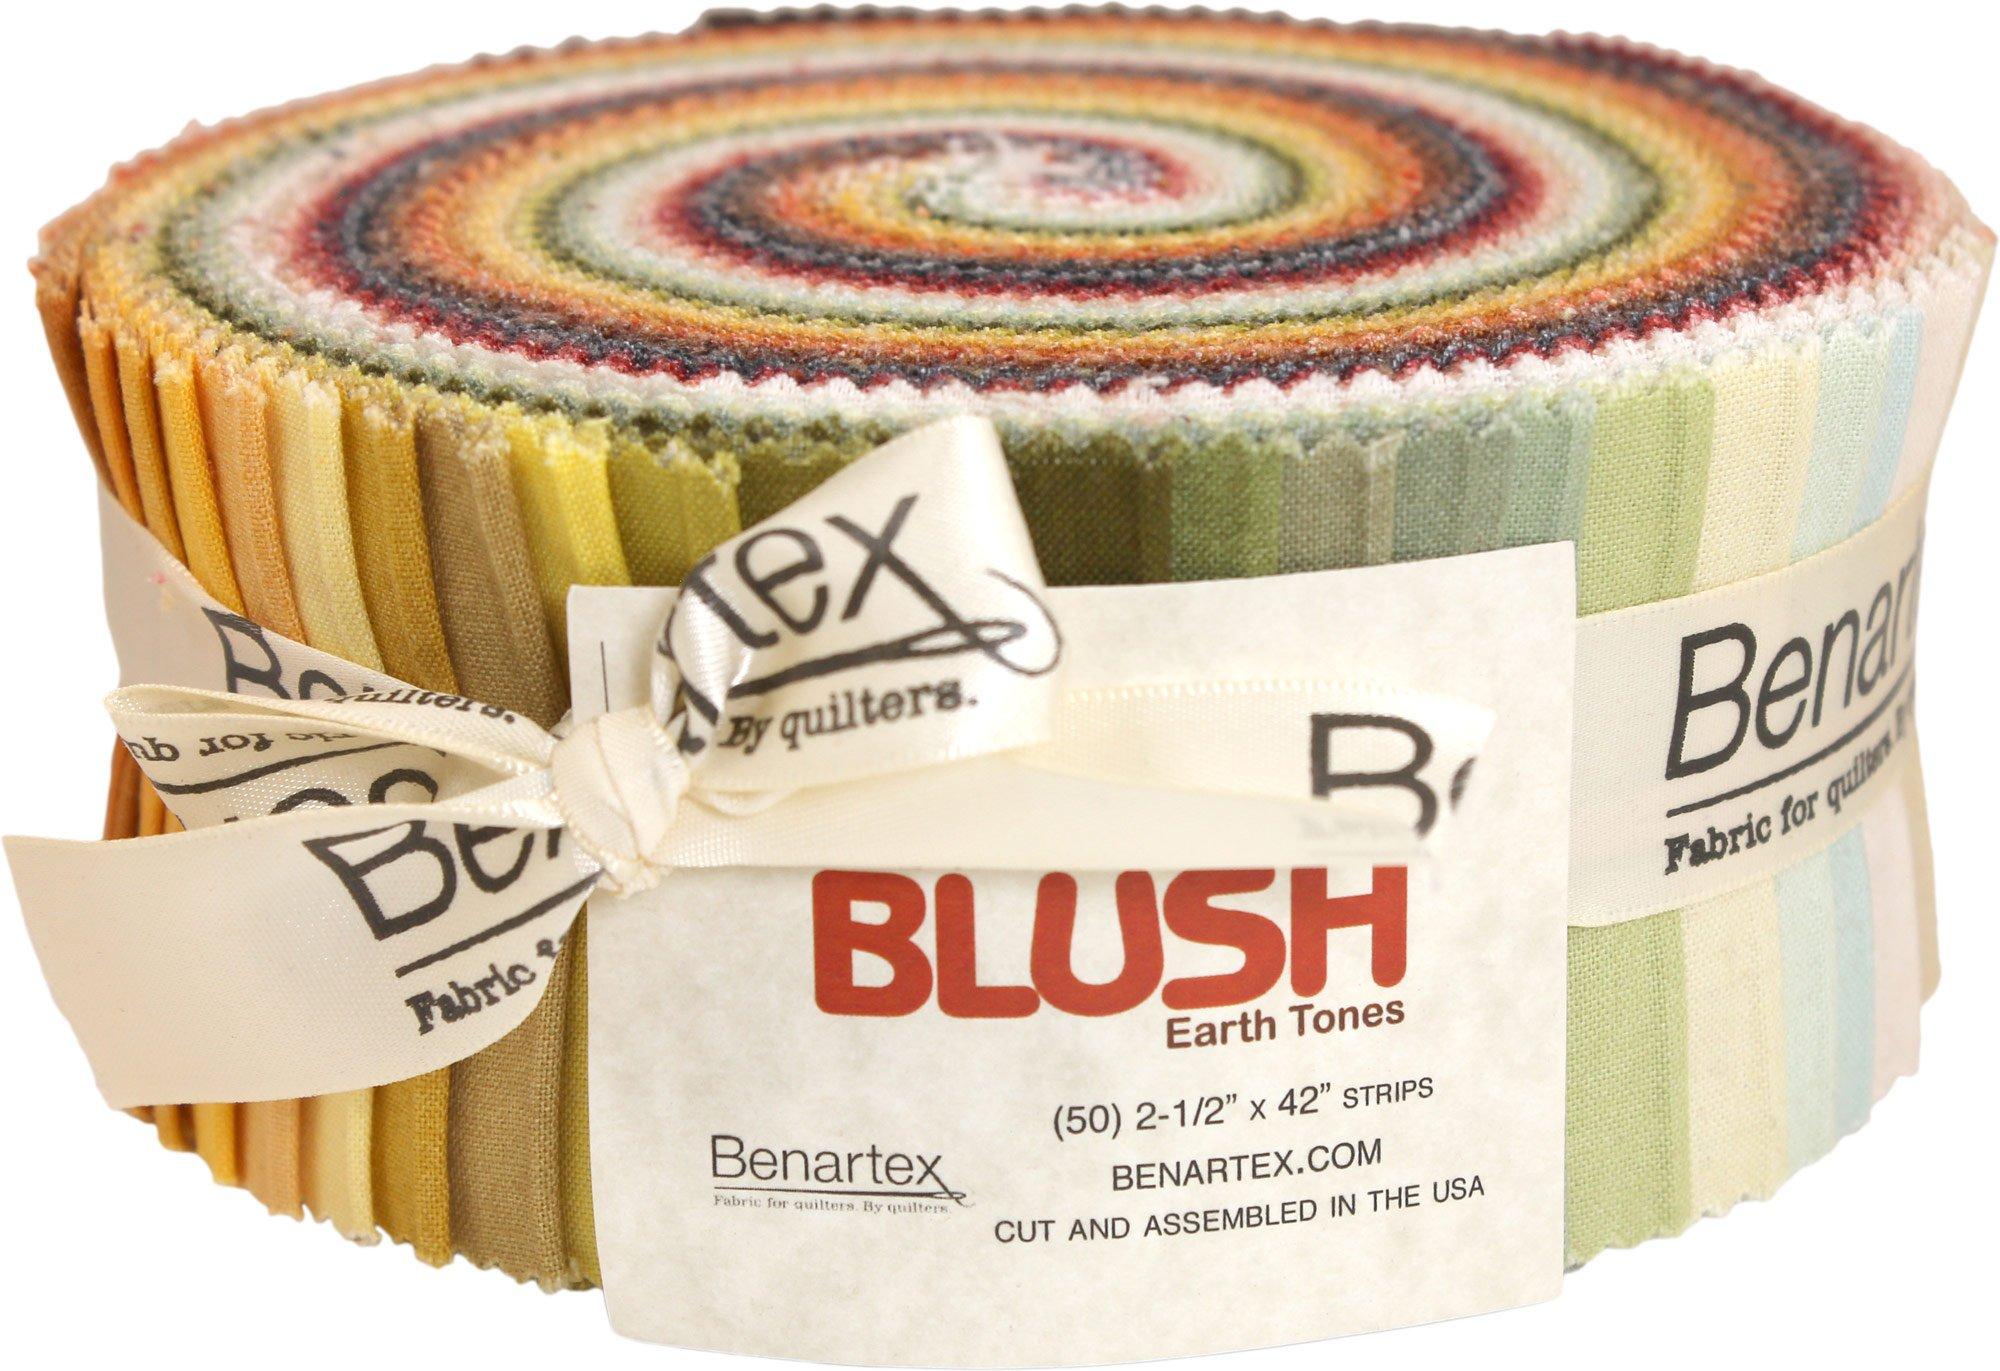 Shadow Blush Earthtones Pinwheel 50 2.5-inch Strips Jelly Roll Benartex